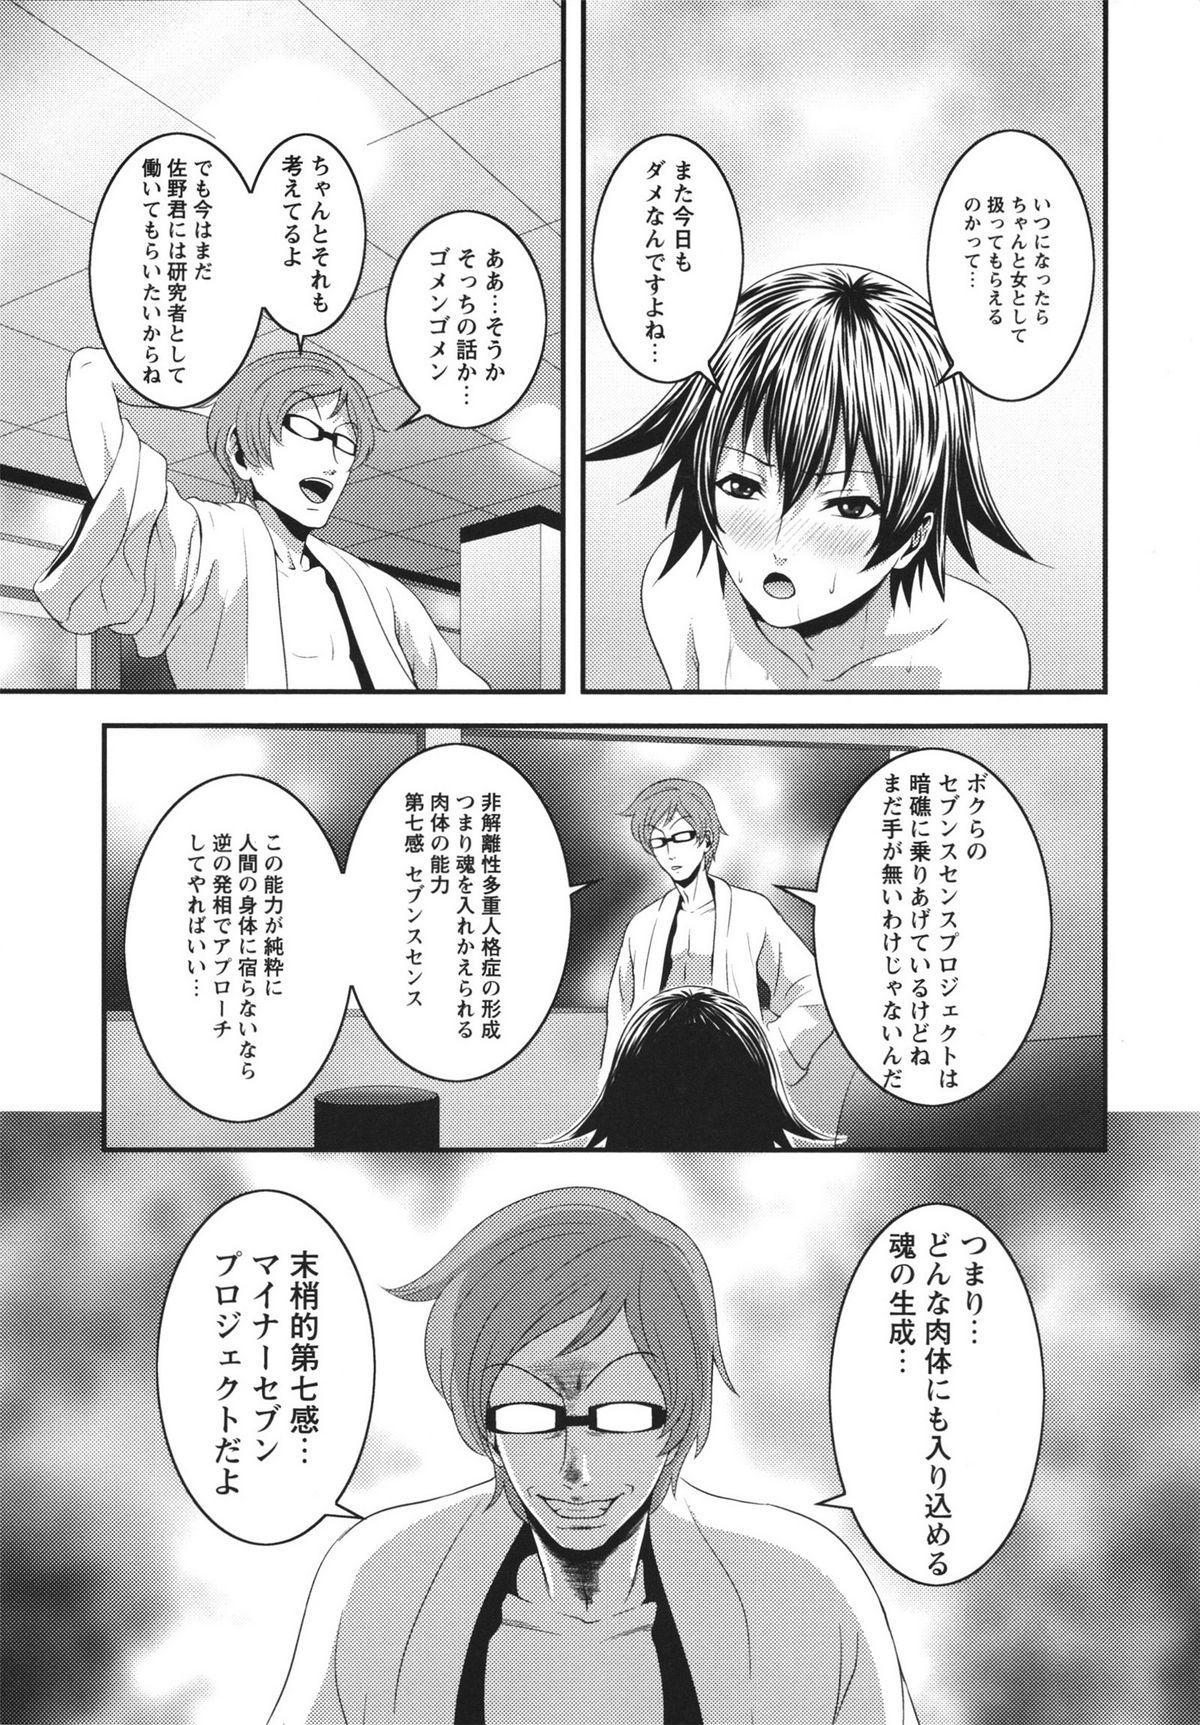 [Kawazuko Chouji] m7 -Minor Seven- Jou 10